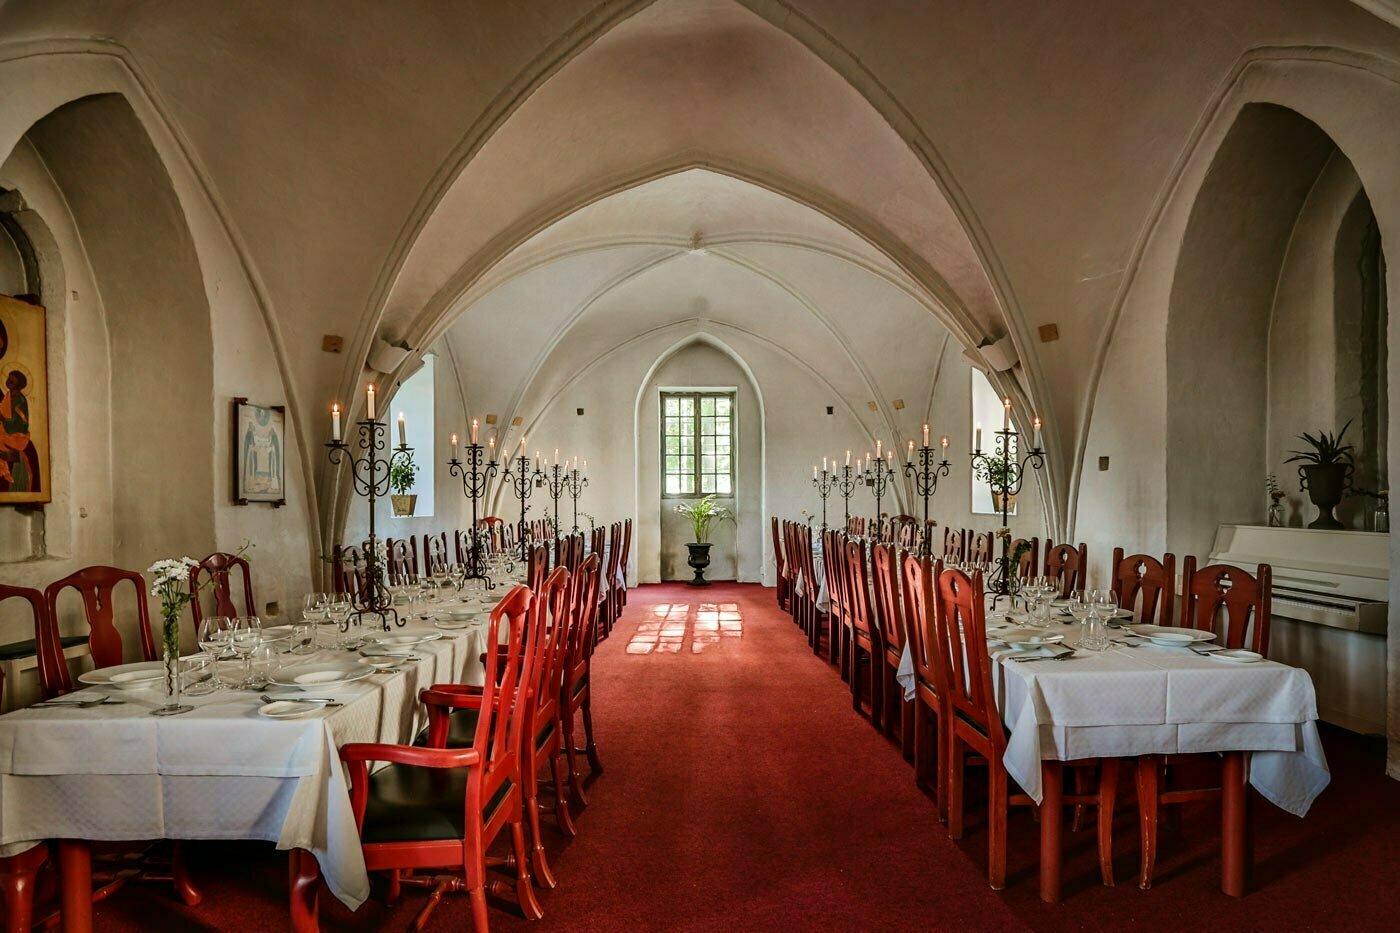 vadstena_klosterhotel-kapitelsalen